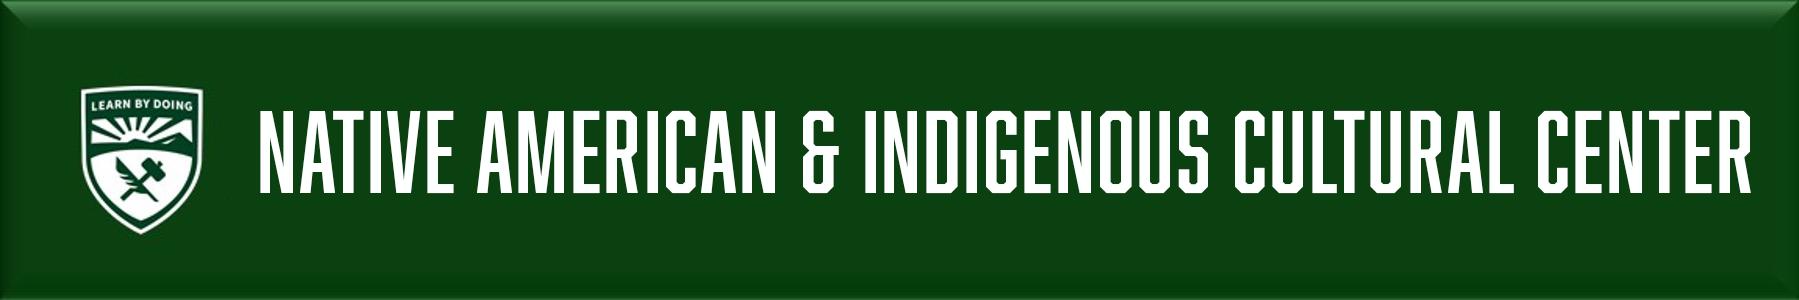 Native American & Indigenous Cultural Center Banner